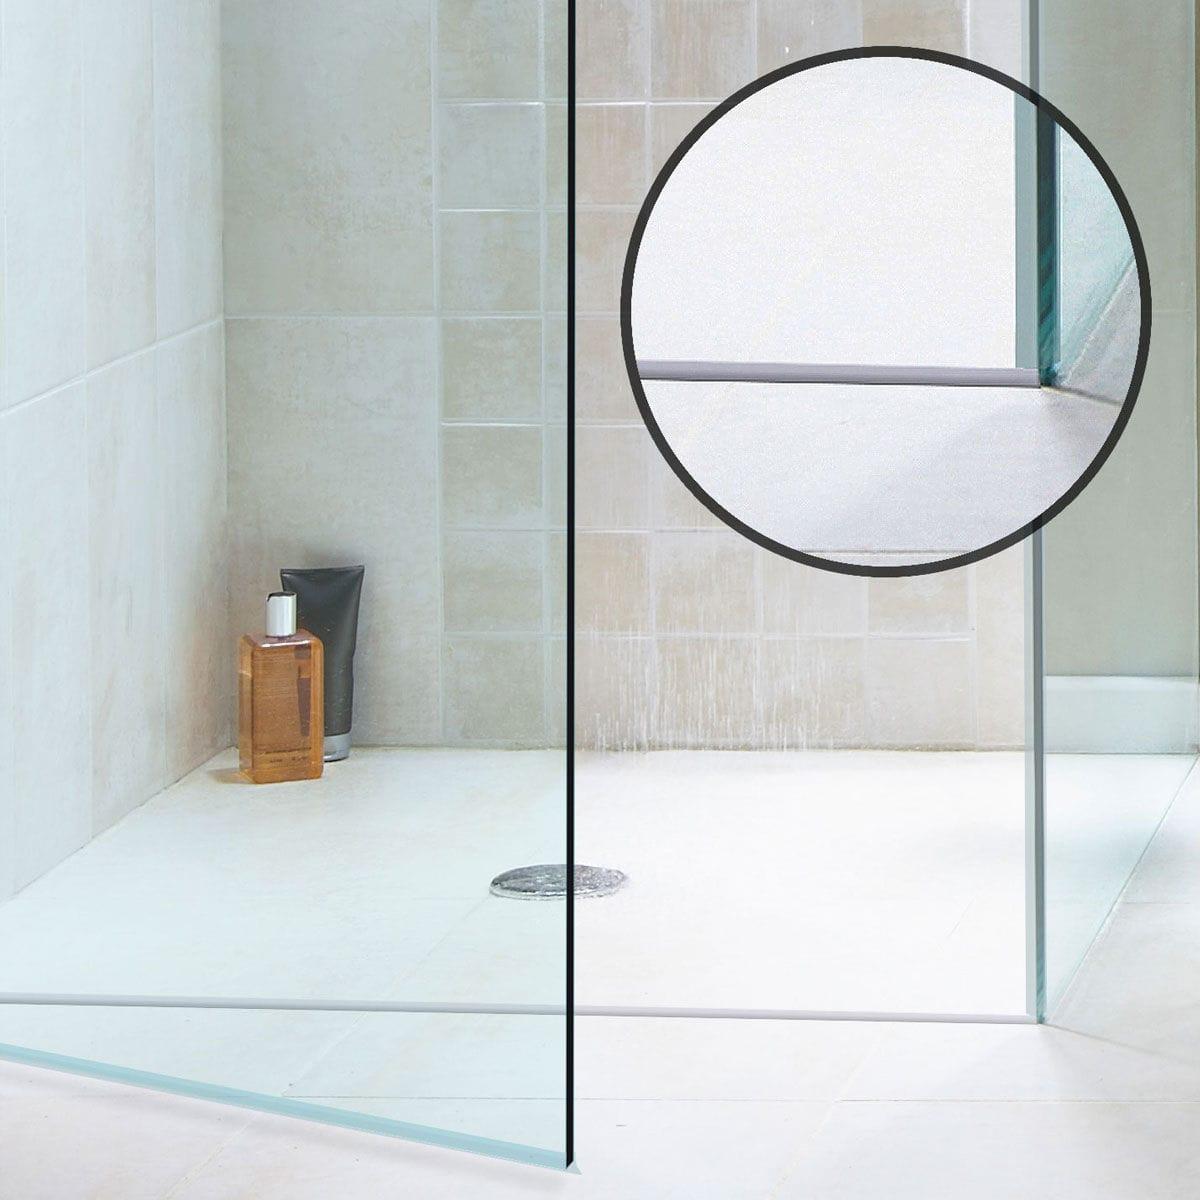 Acrylic edge trim / for showers - SHOWER THRESHOLD - JKB Group